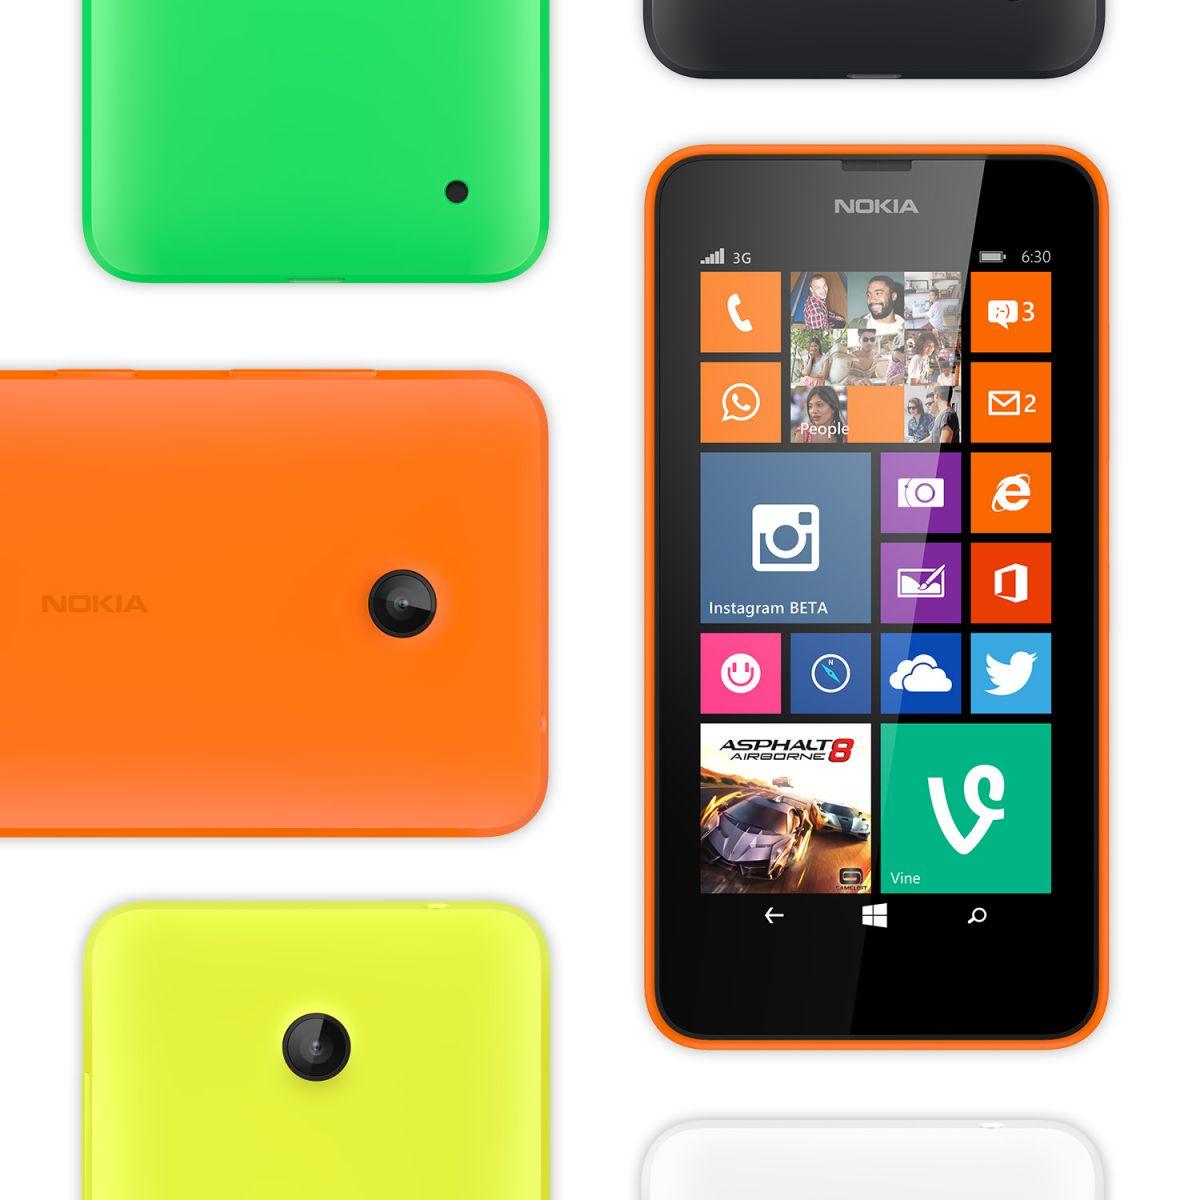 Billedgalleri af Nokia Lumia 630